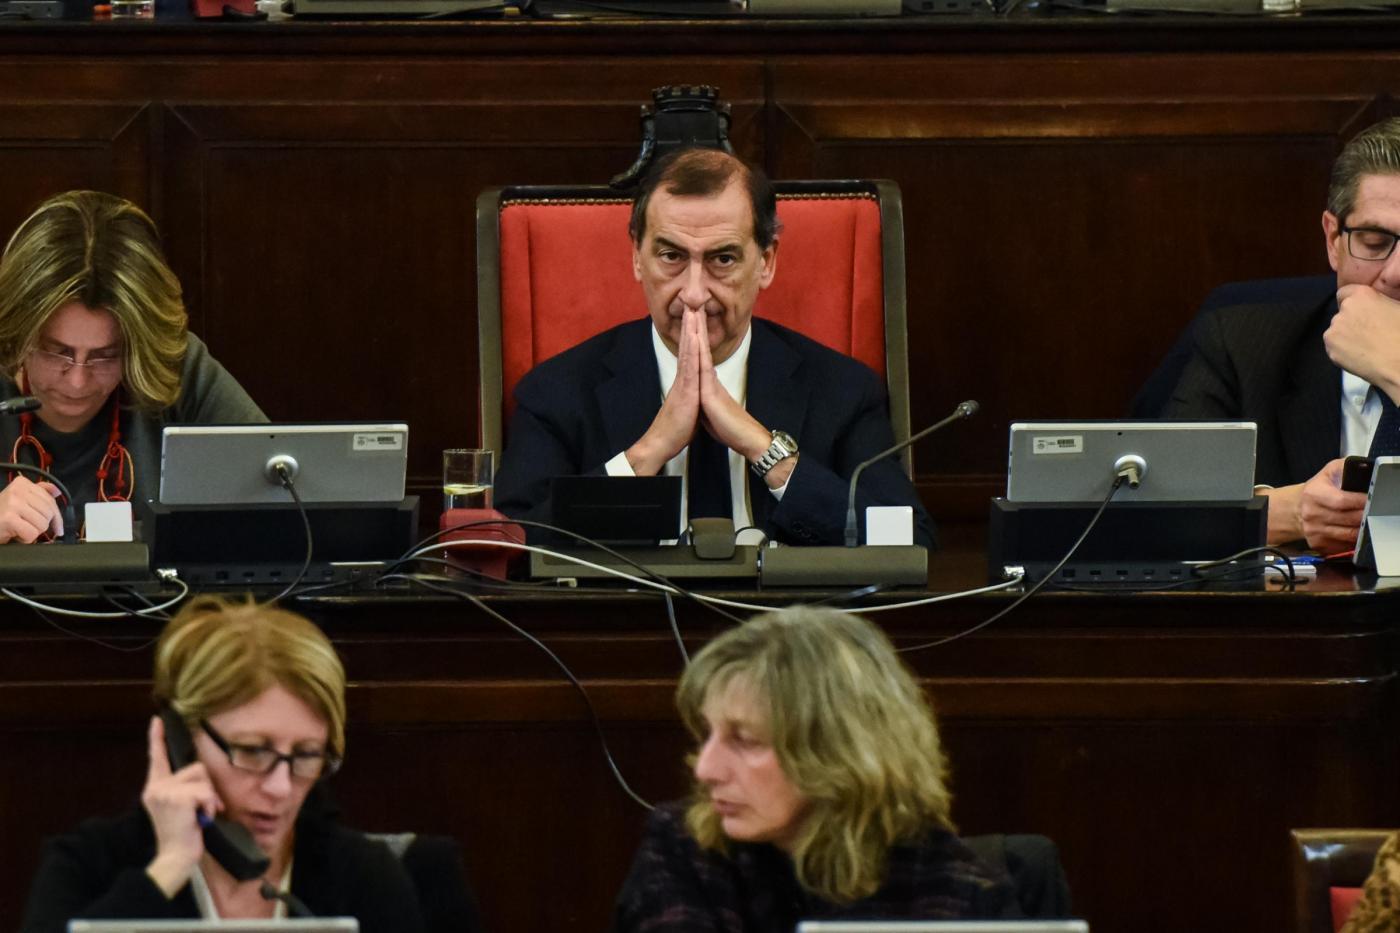 Milano Consiglio comunale con Giuseppe Sala